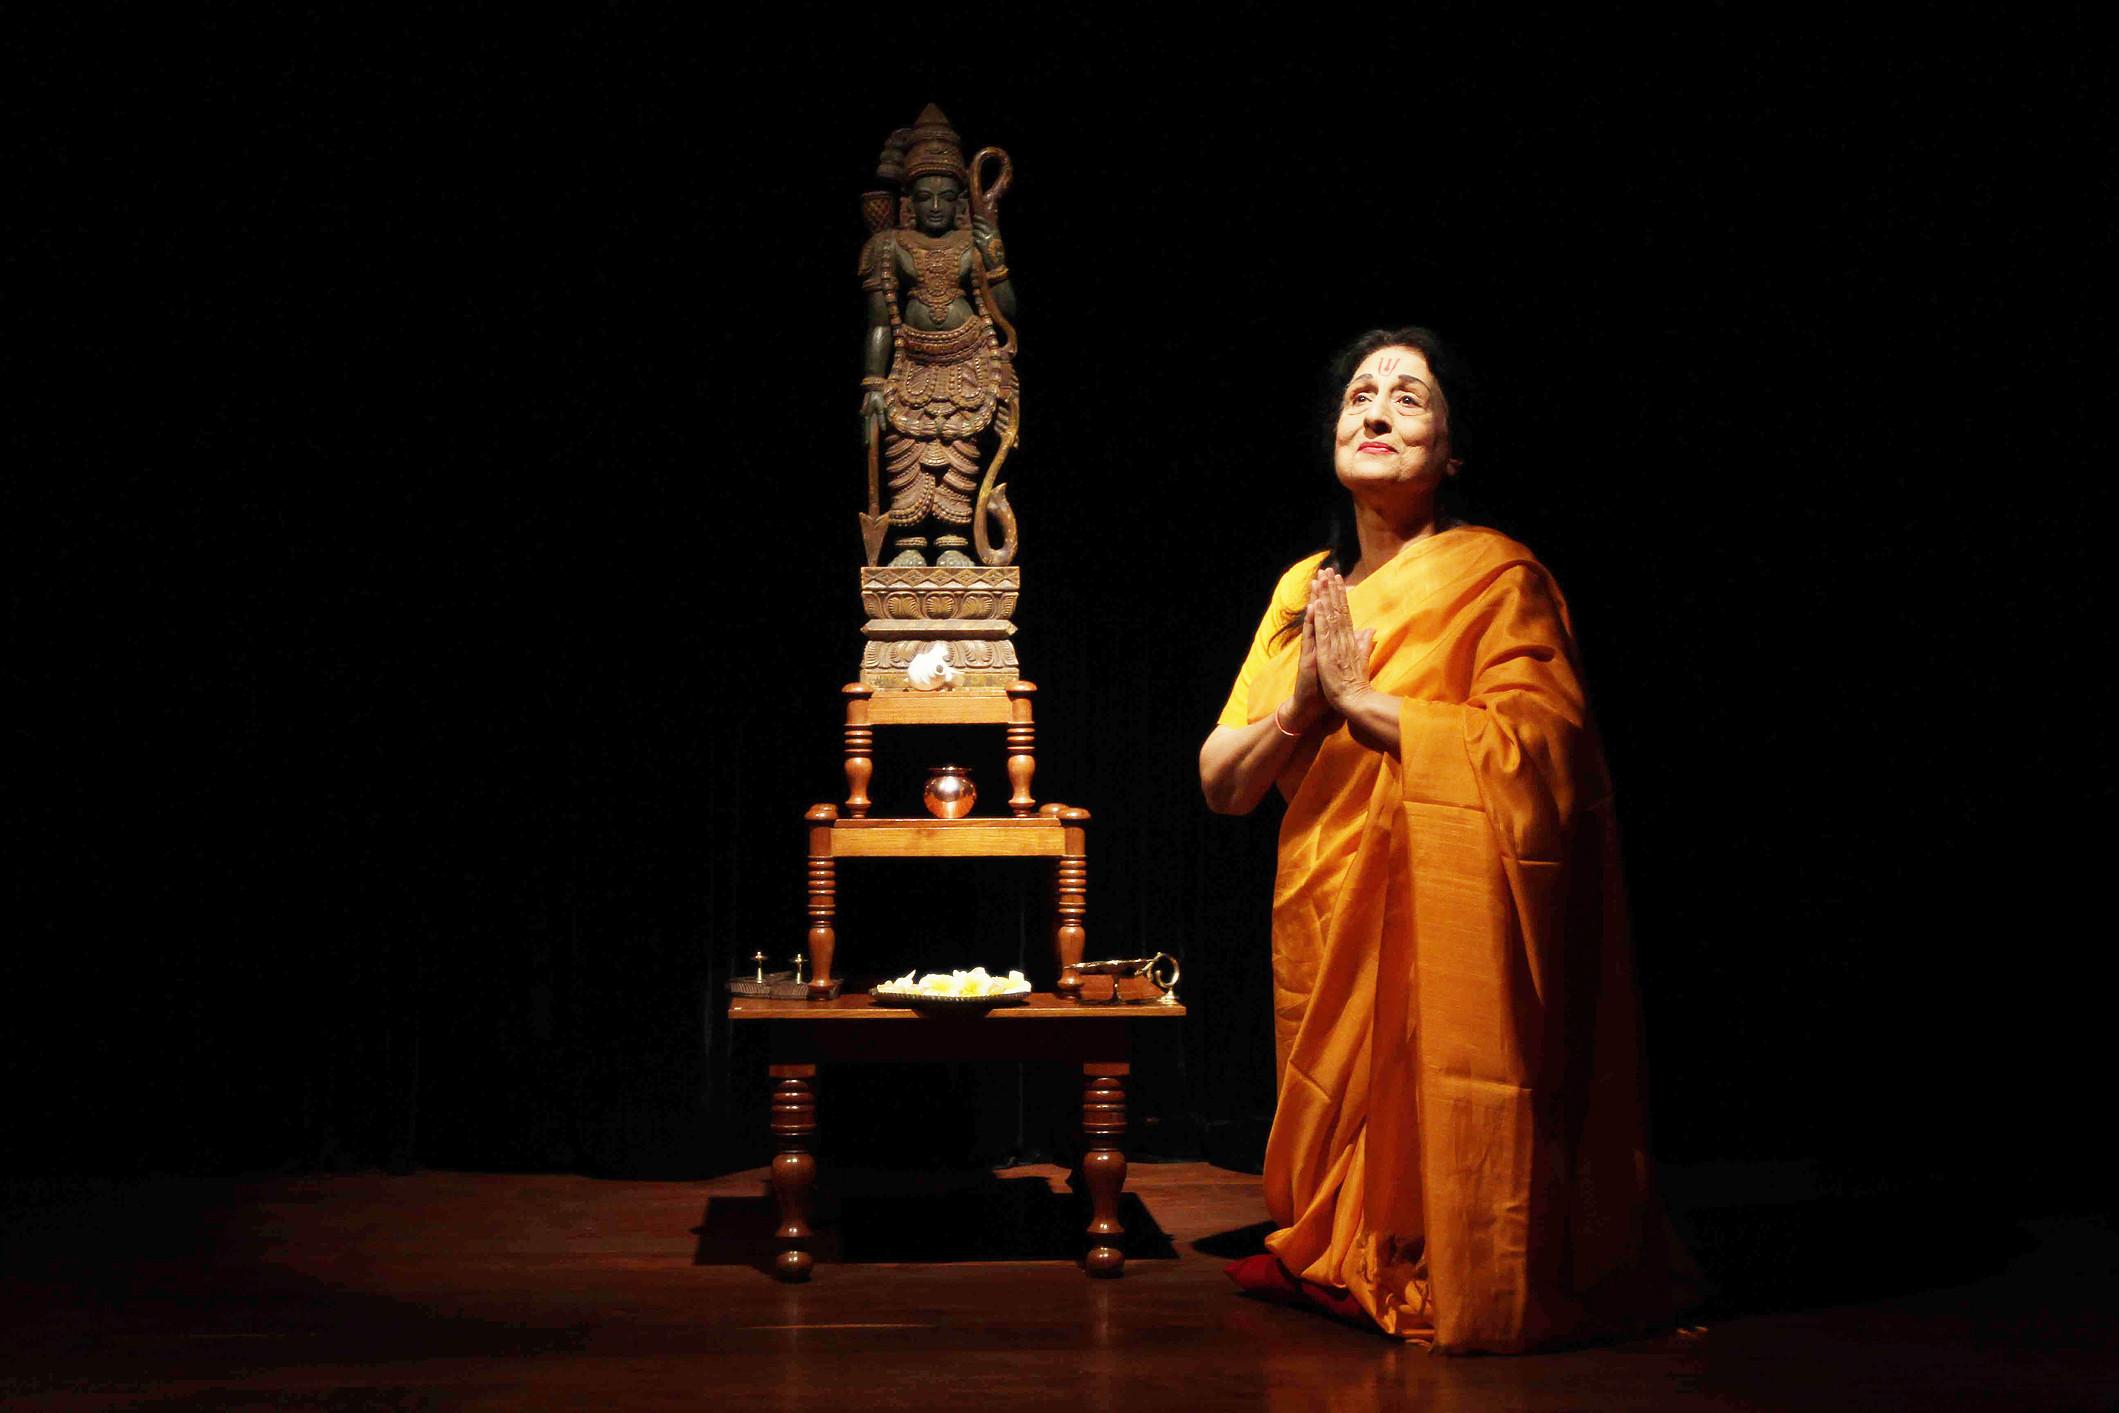 Jalabala Vaidya in 'The Ramayana' (Photograph: Courtesy Aksharatheatre.com).